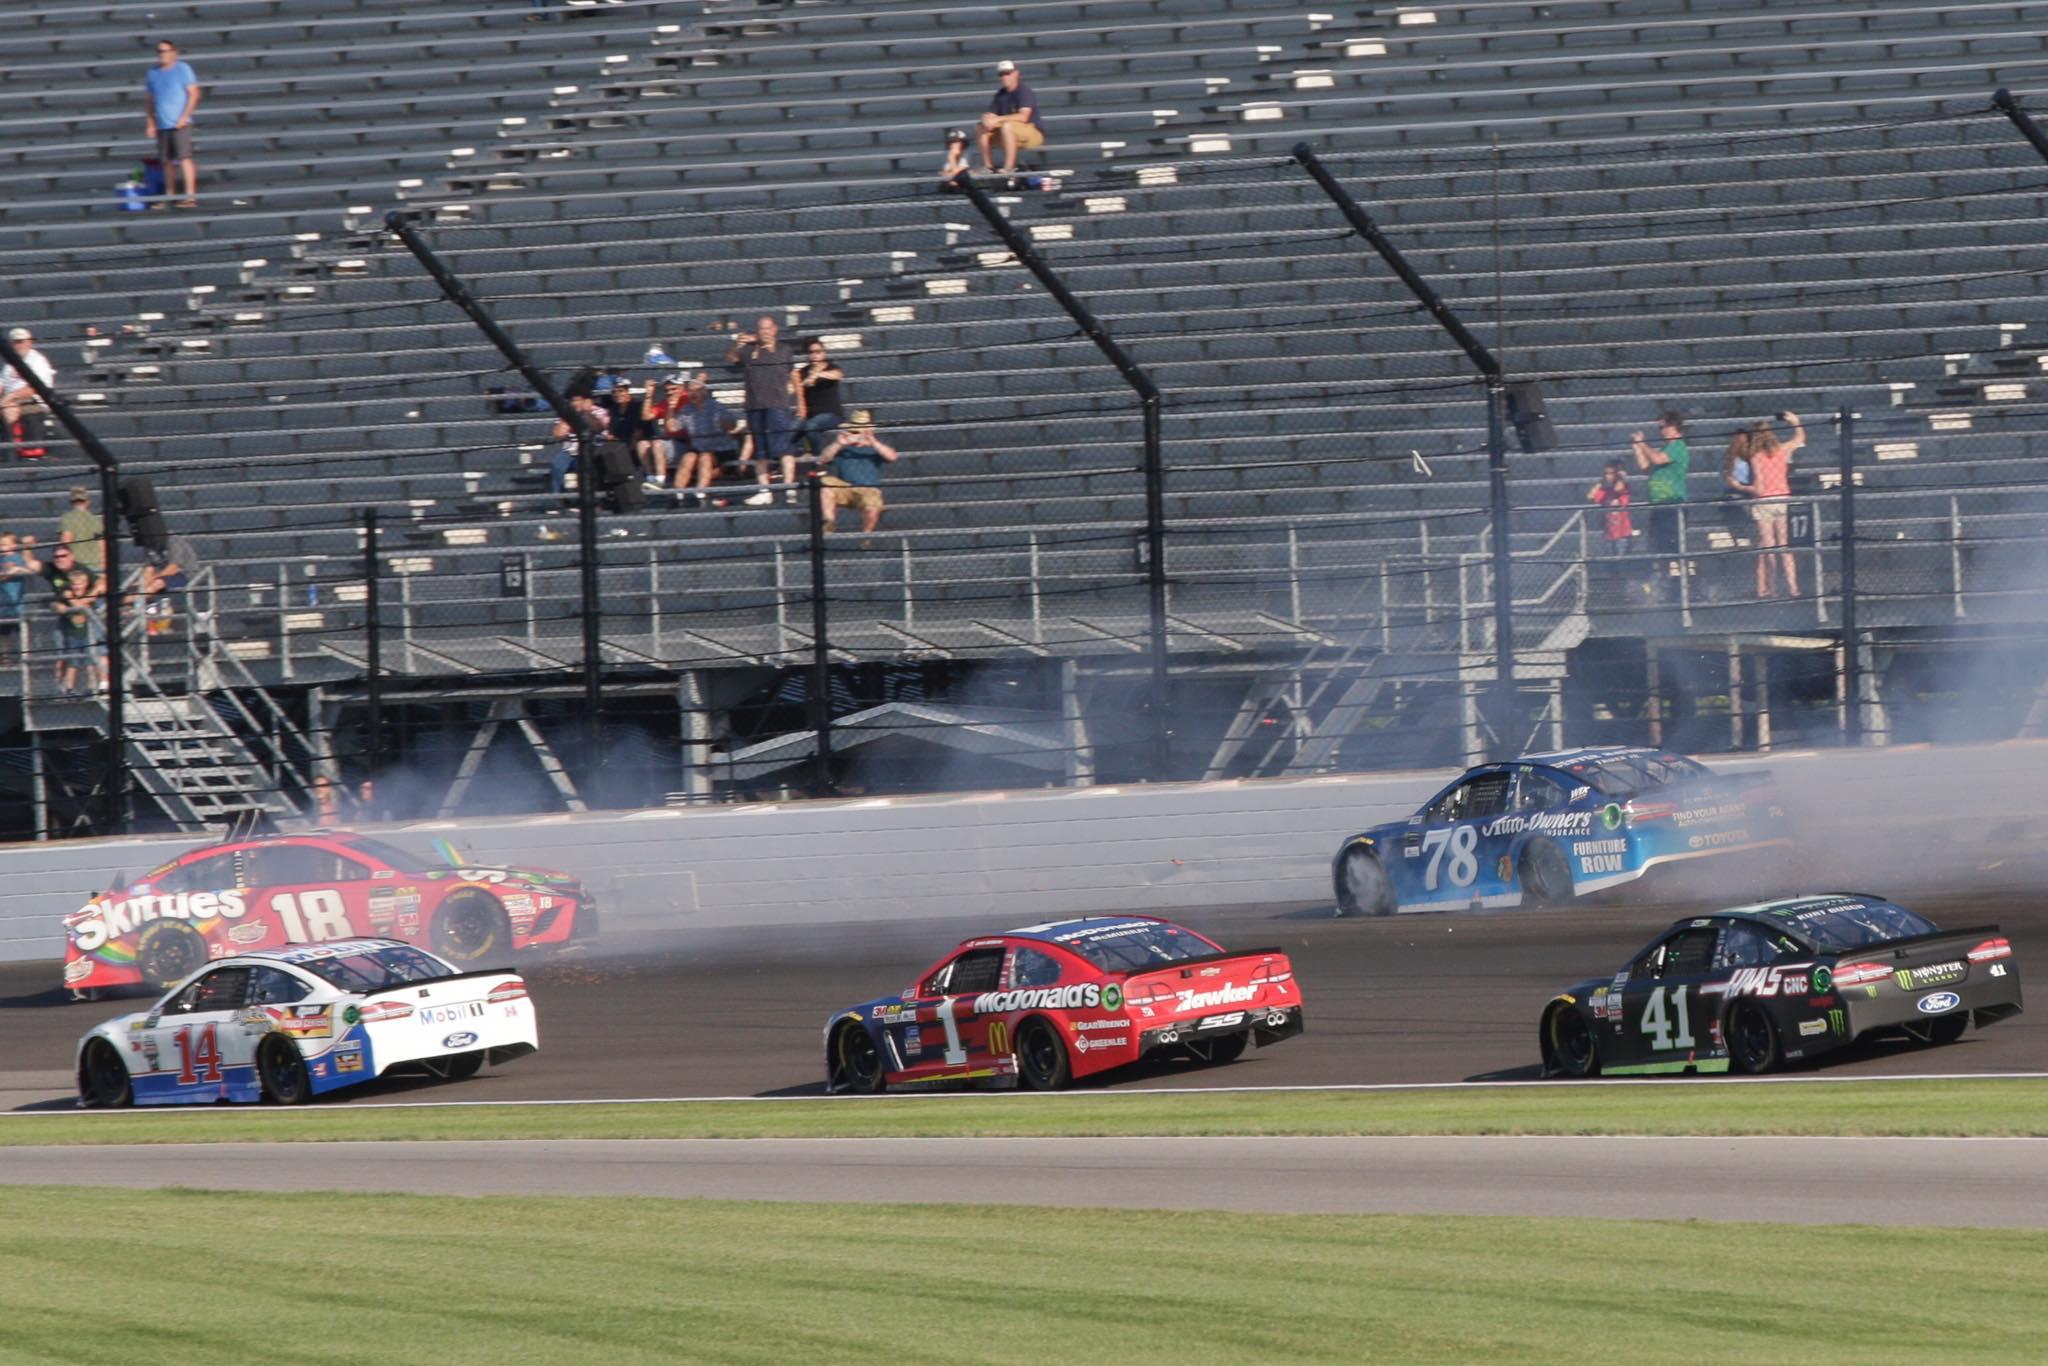 Kyle Busch vs Martin Truex Jr at Indianapolis Motor Speedway